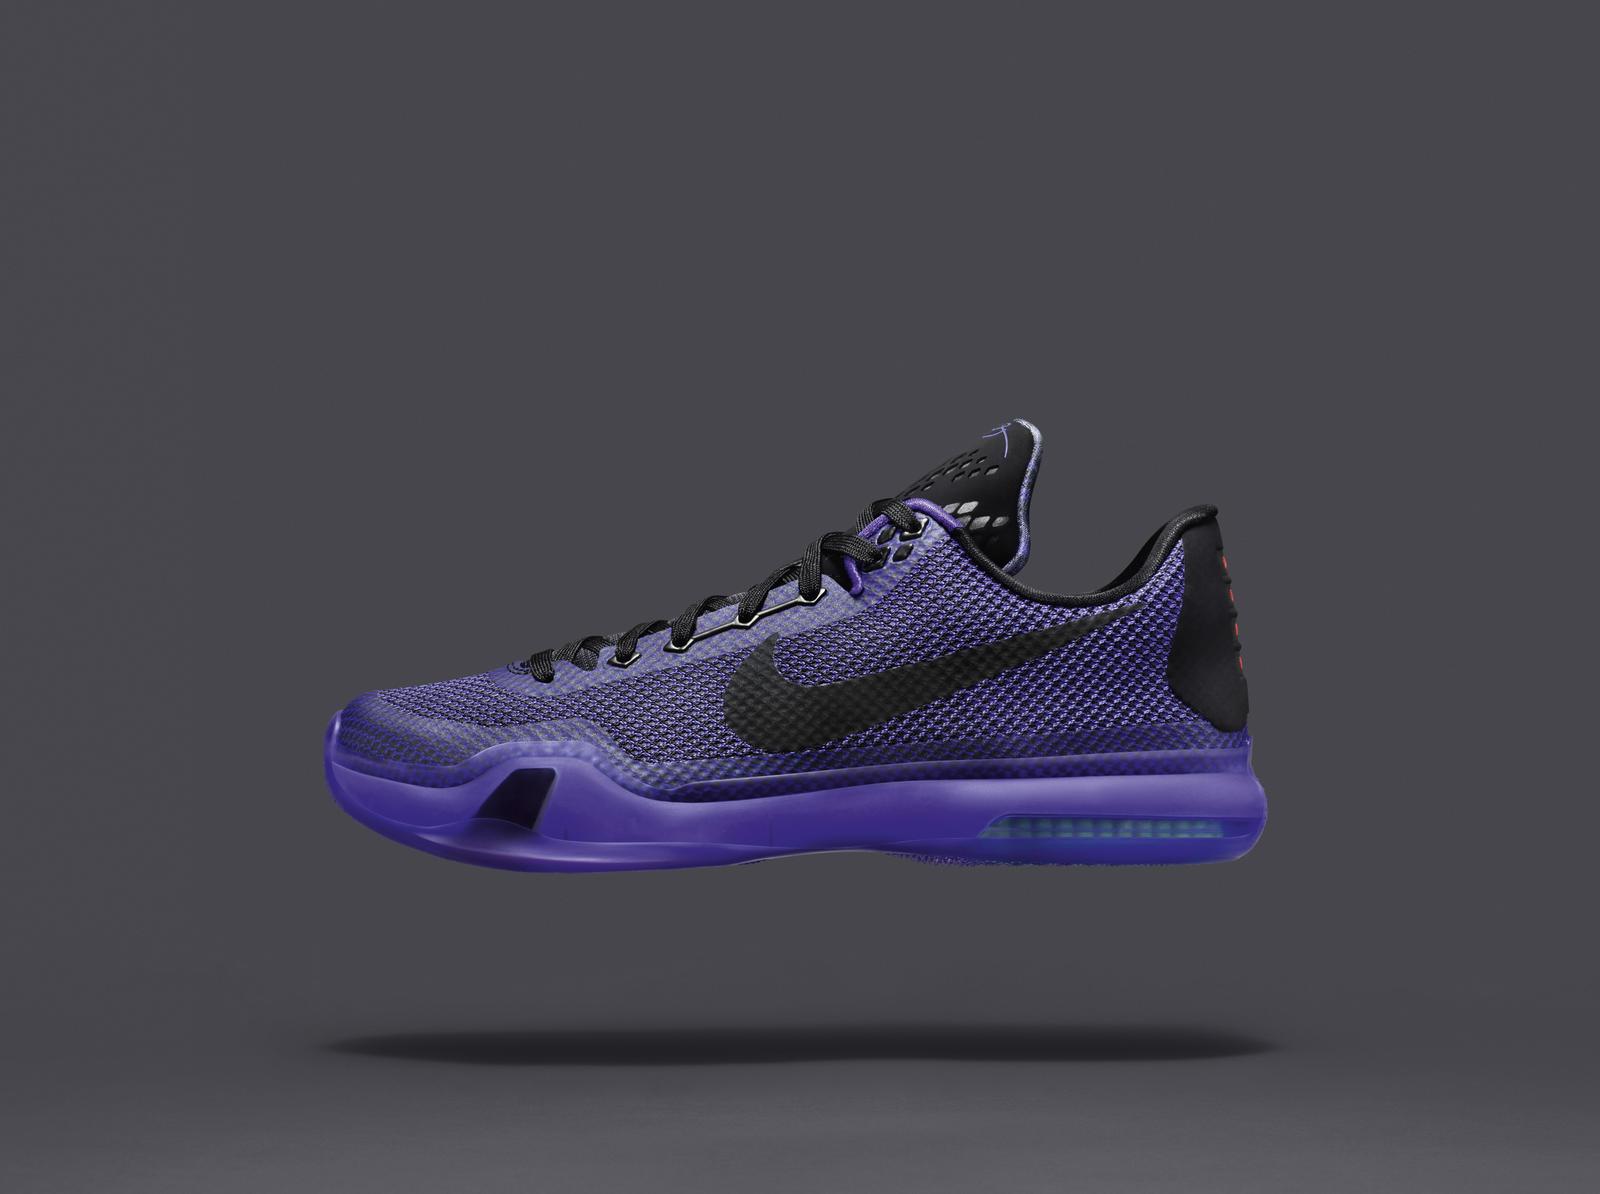 Nike Kobe Basketball Shoes Green